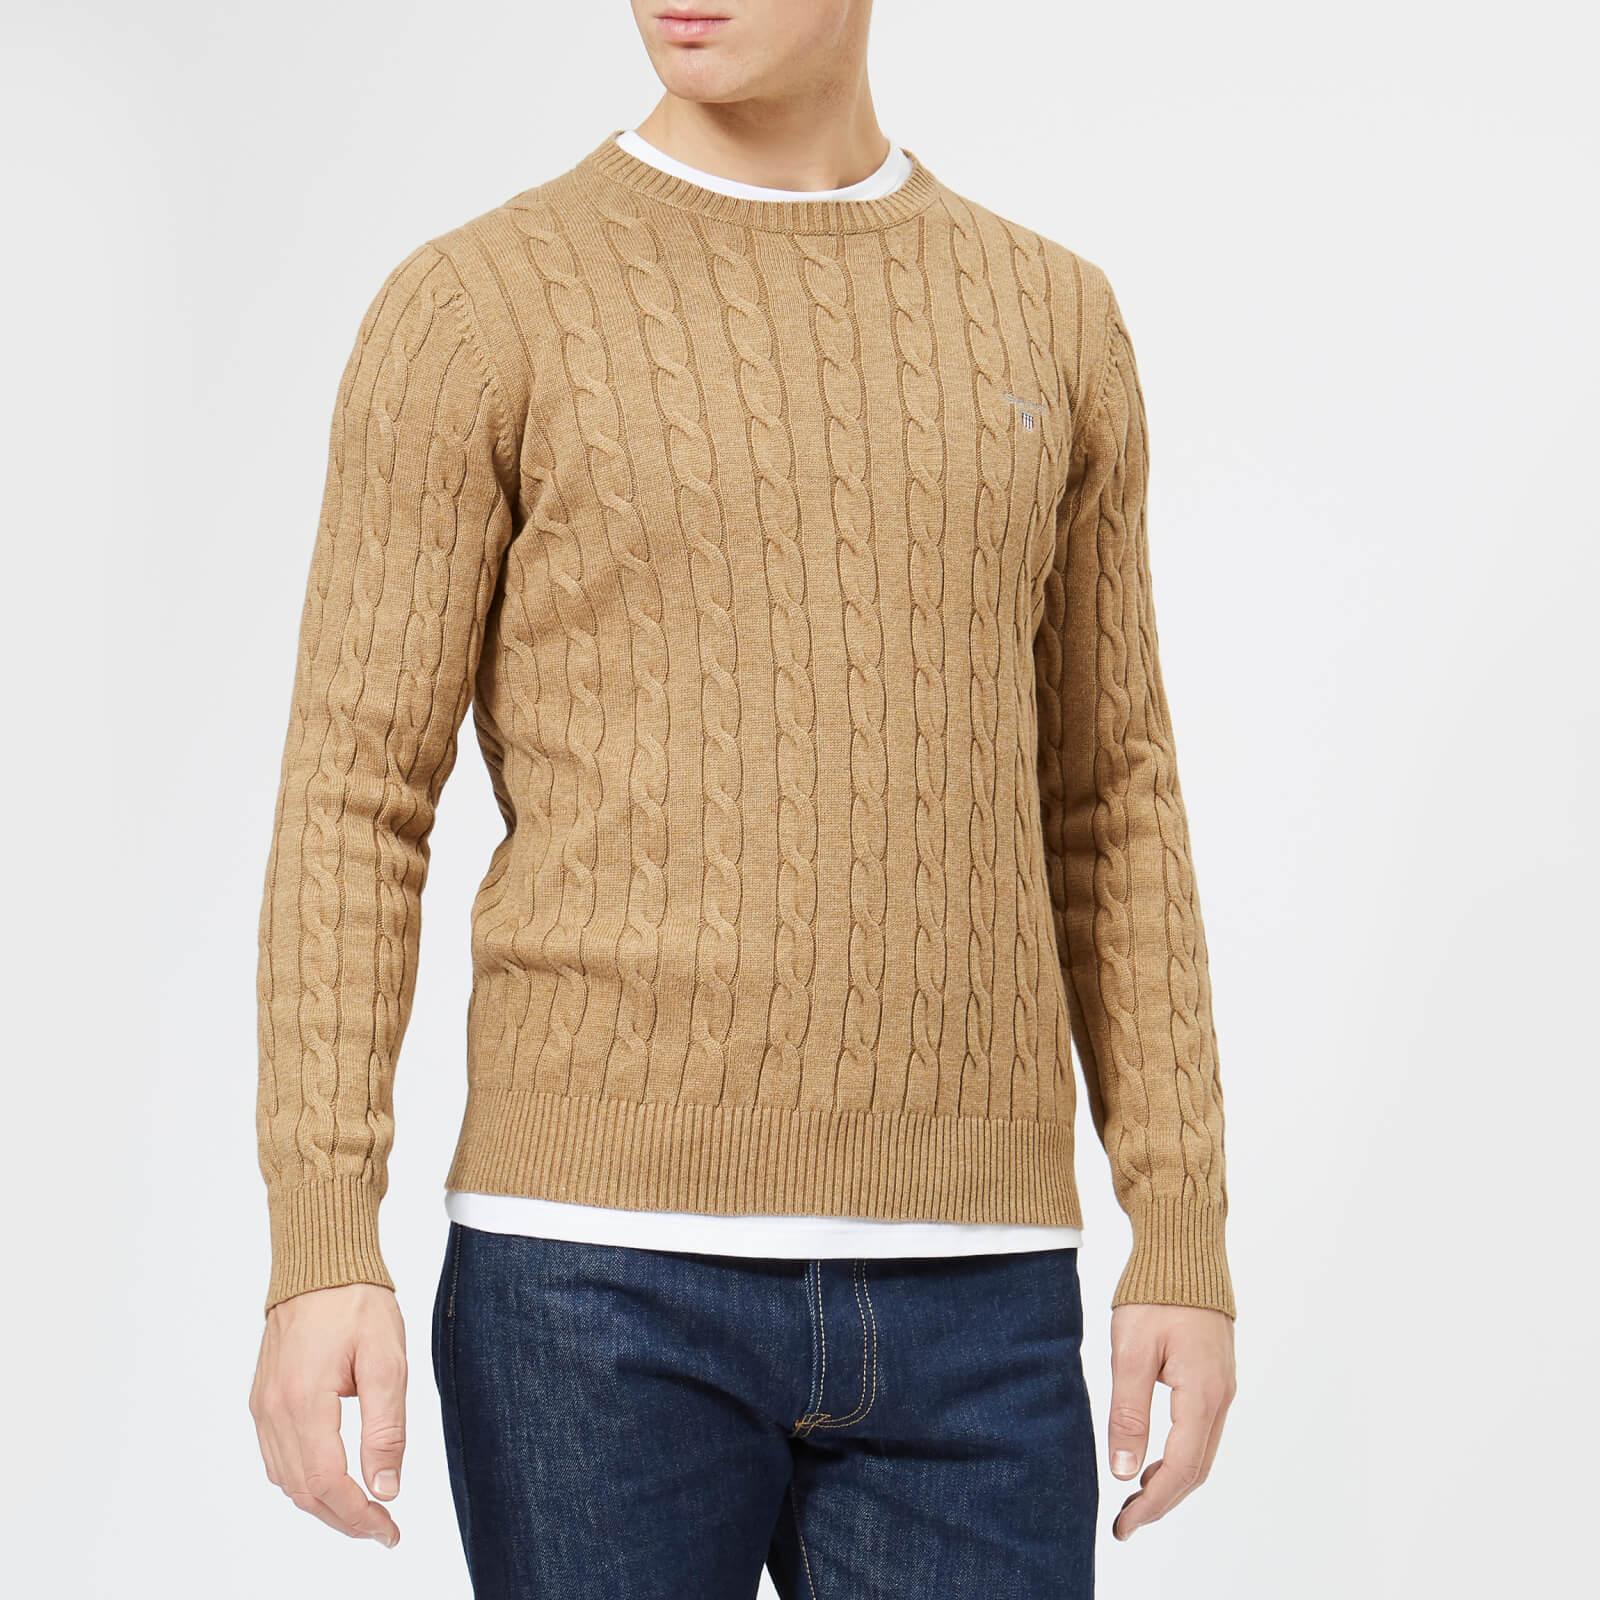 6674d4472c15b2 GANT Men's Cotton Cable Crew Knitted Jumper - Dark Sand Melange Mens  Clothing | TheHut.com